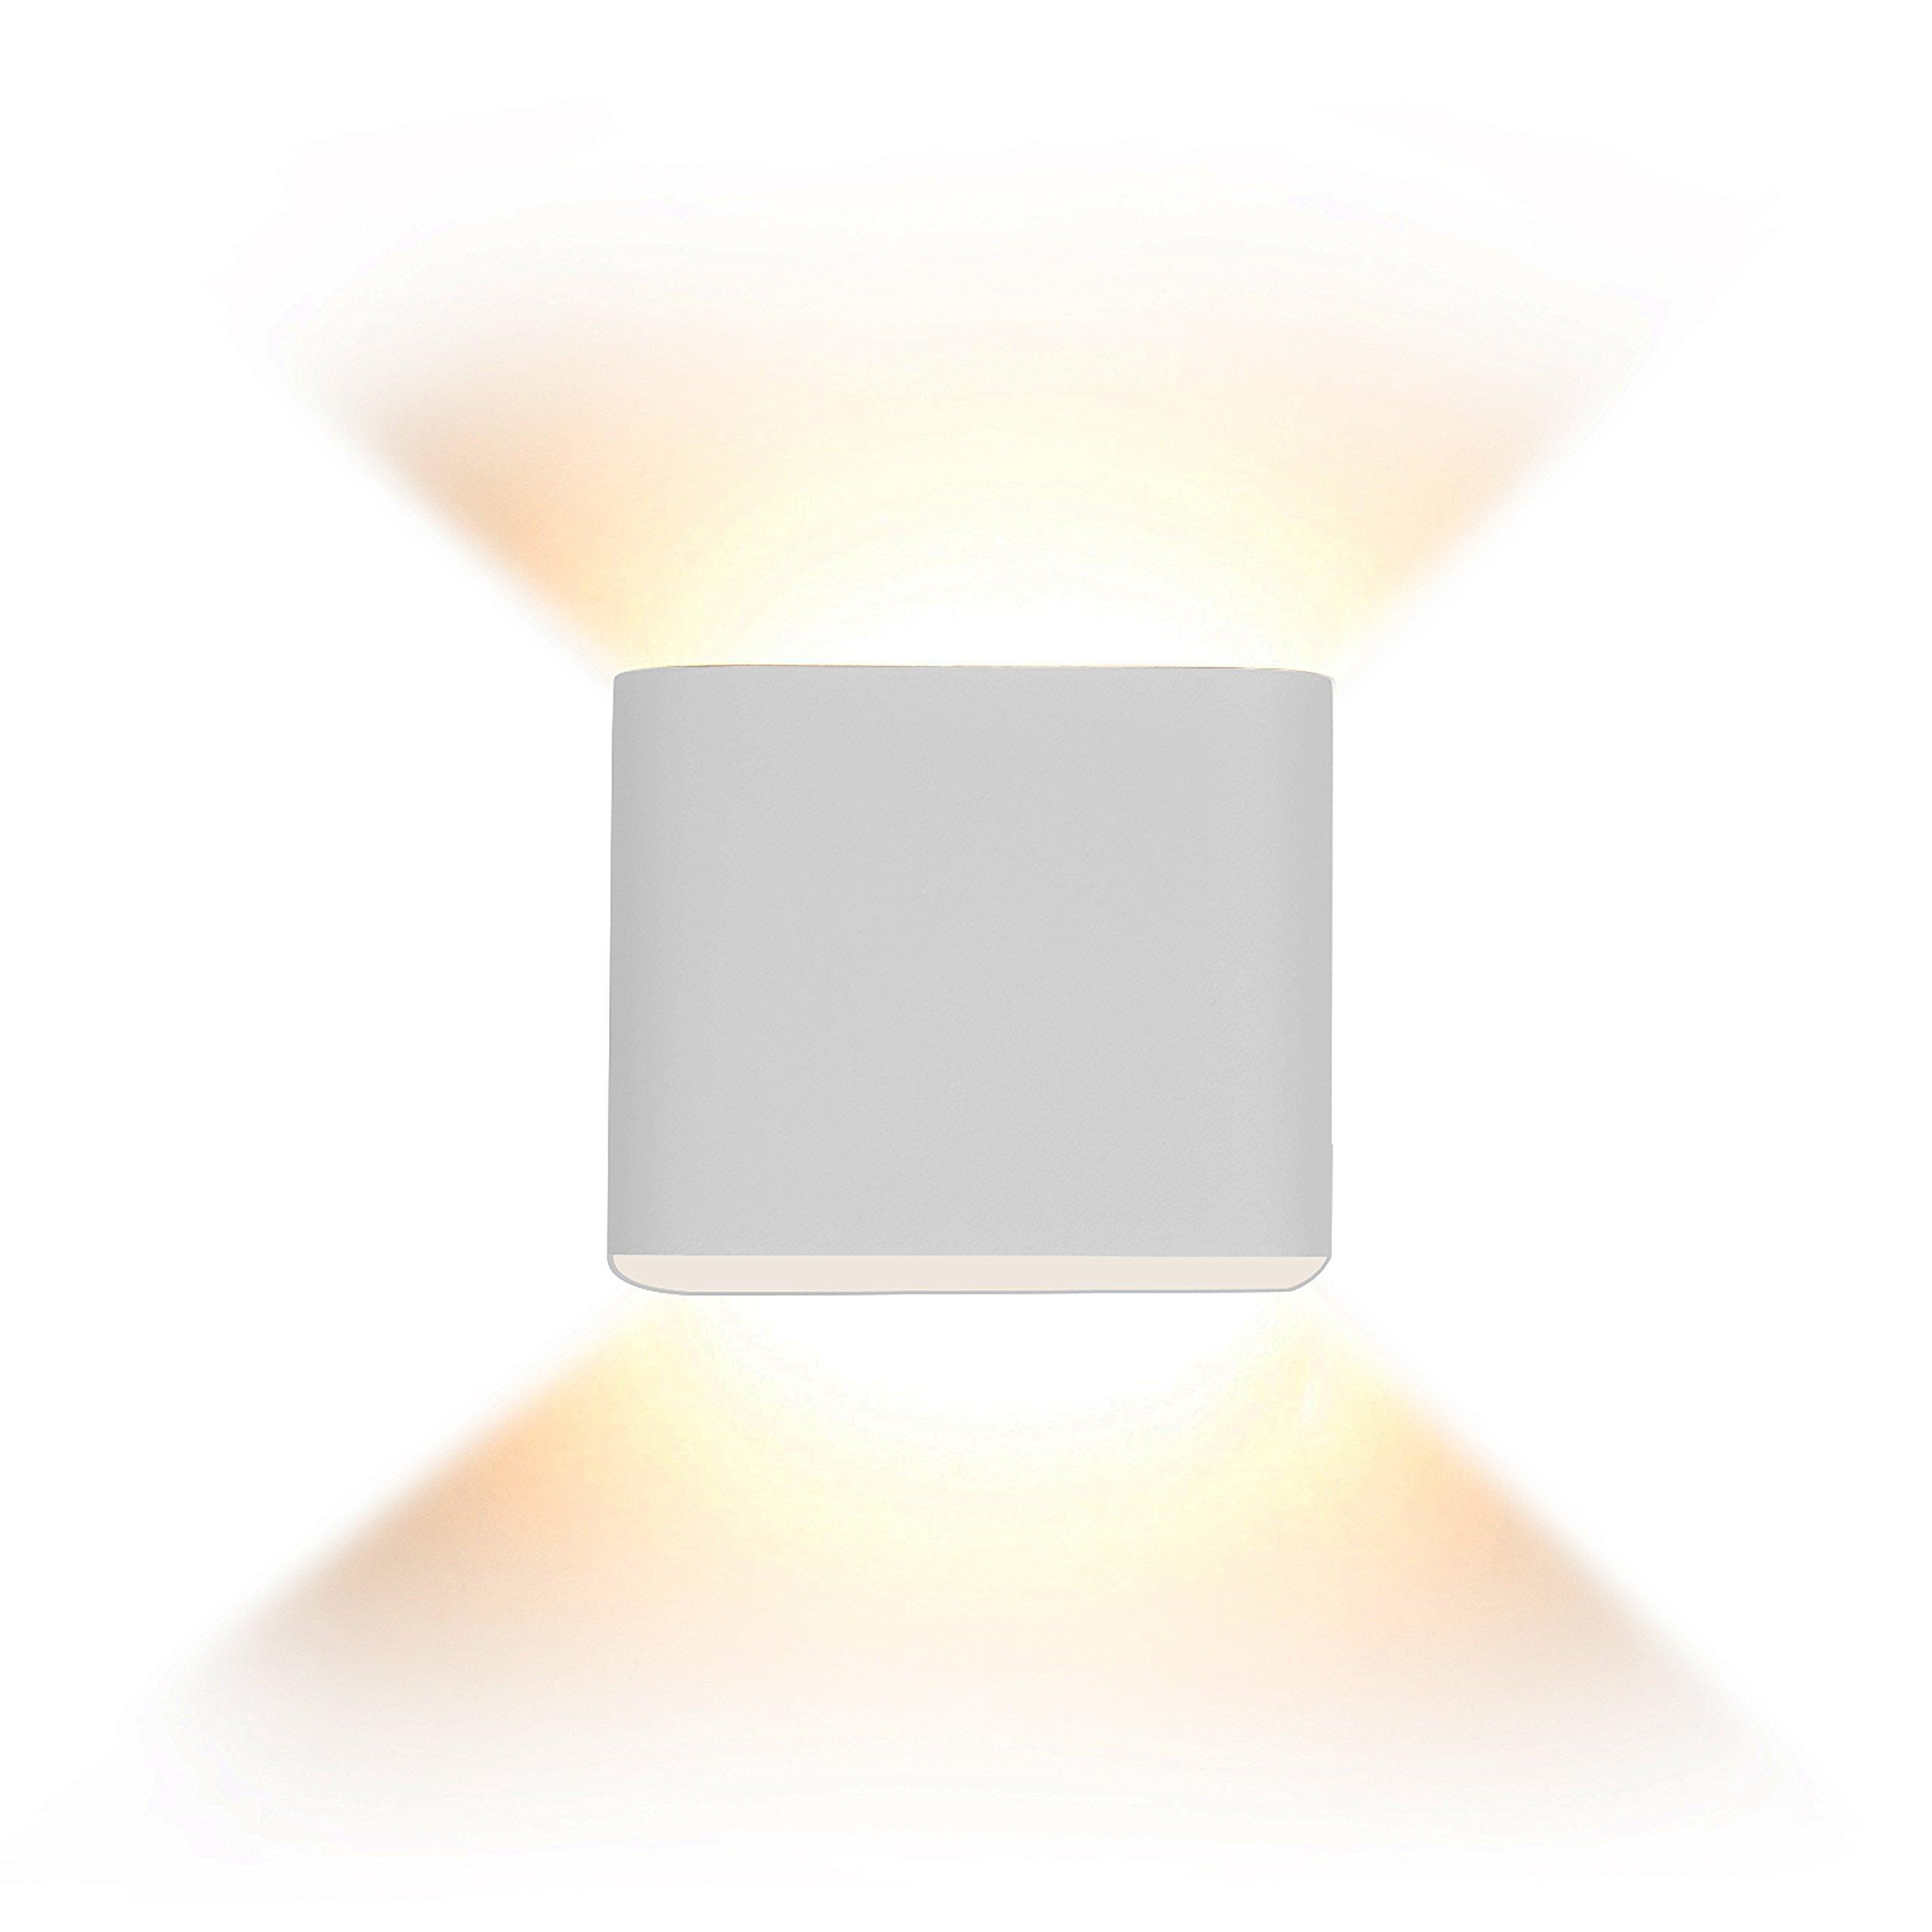 Lightess Up Down Wall Sconces Mini Wall Lights LED 5W Aluminum Design 2700K Warm White